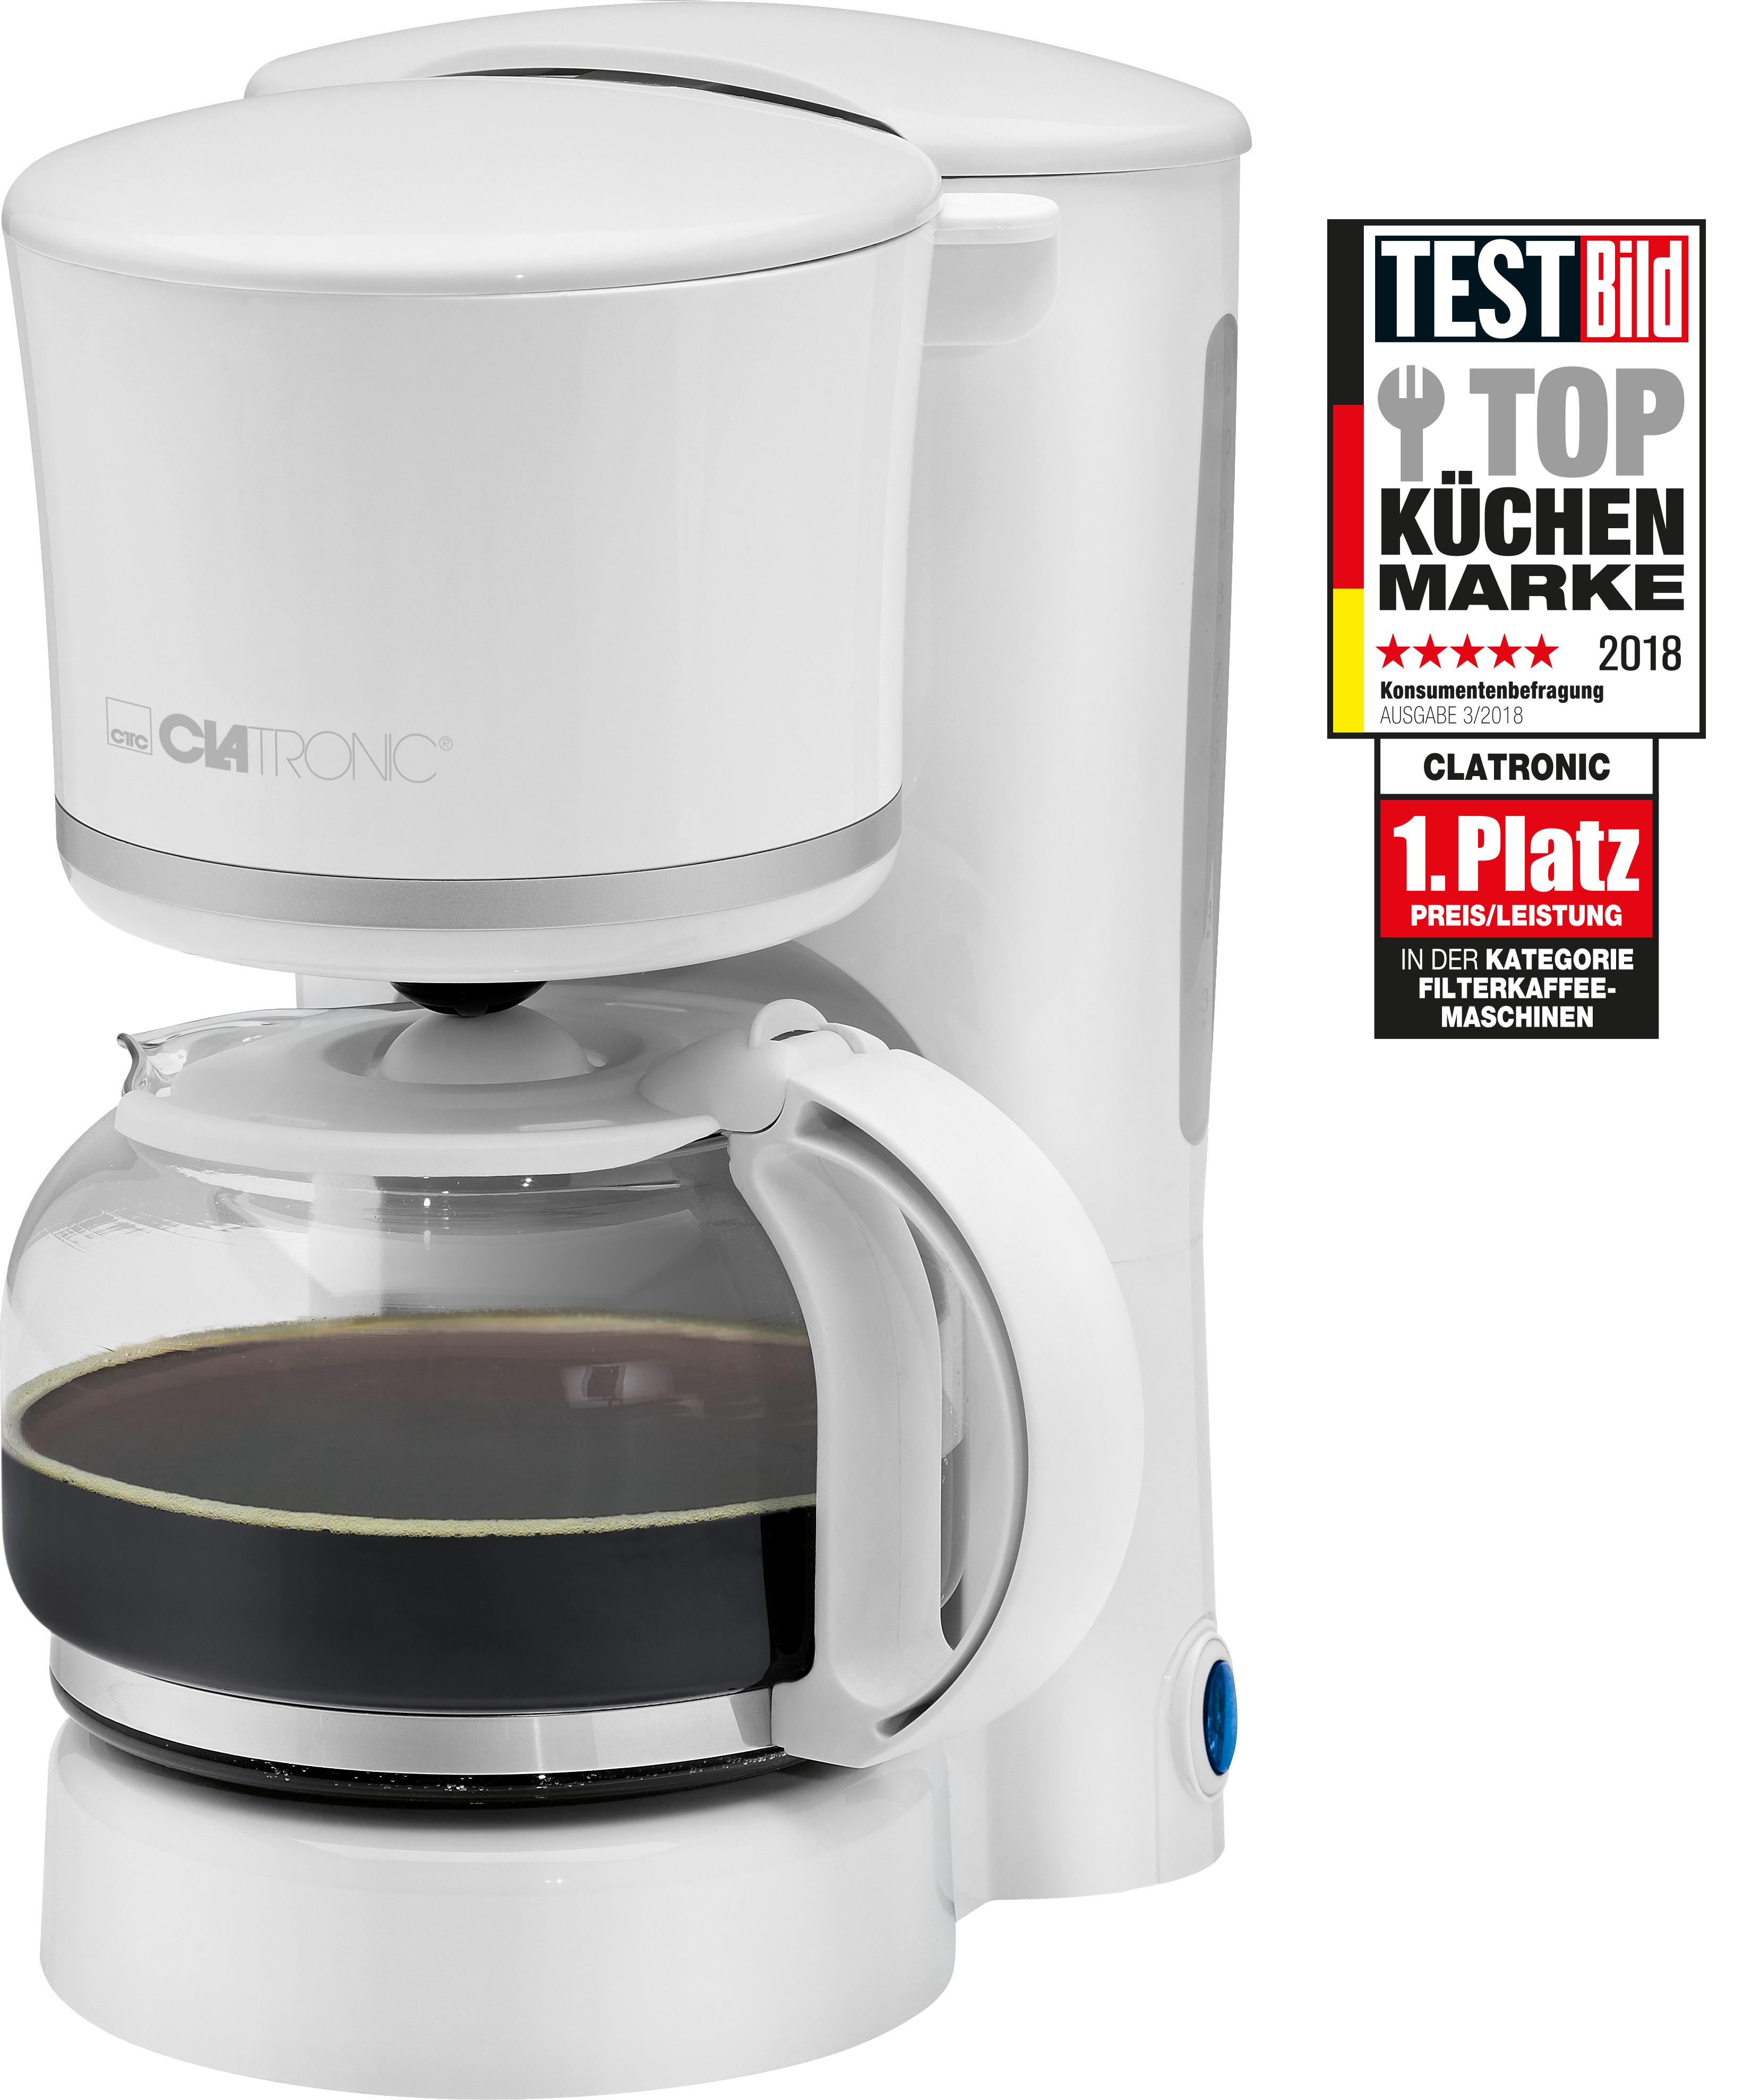 870 W color negro libre BPA funci/ón de mantenedora calor m/áquina caf/é de filtro capacidad 8 a 10 tazas 1,25 litros Cafetera el/éctrica de goteo autom/ática Bomann KA 1575